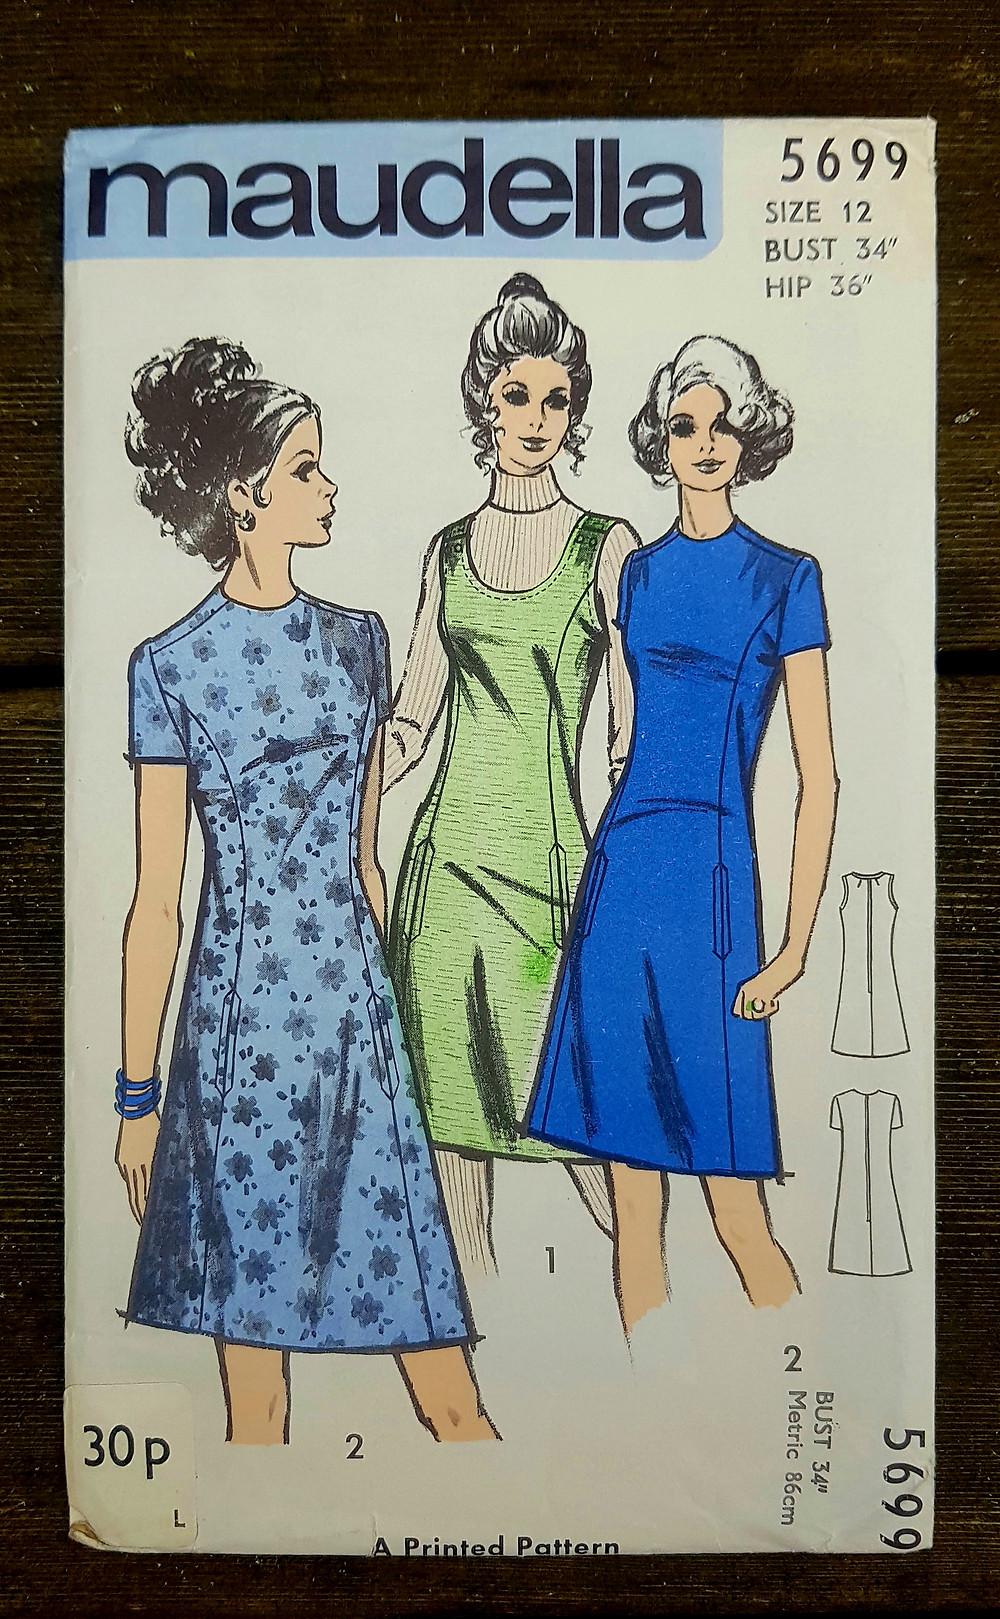 Maudella 5699 dress with pockets